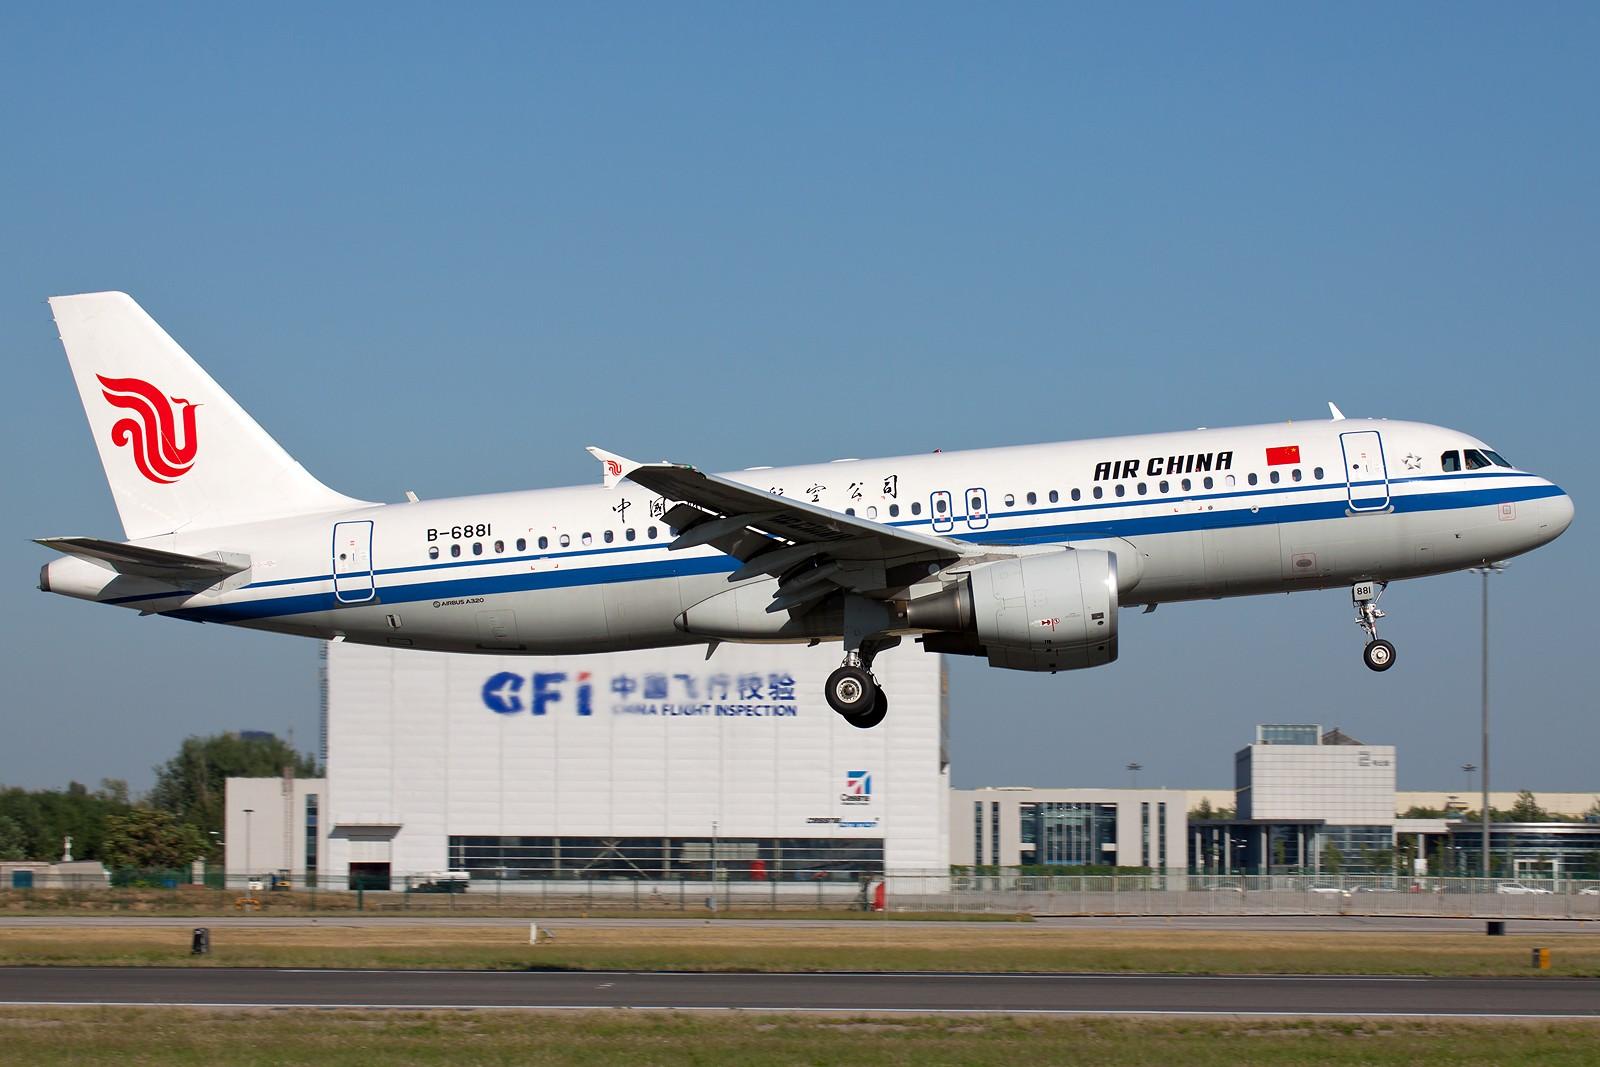 Re:[原创]国航一组 B737&A320系列 [10pics] AIRBUS A320-200 B-6881 中国北京首都机场